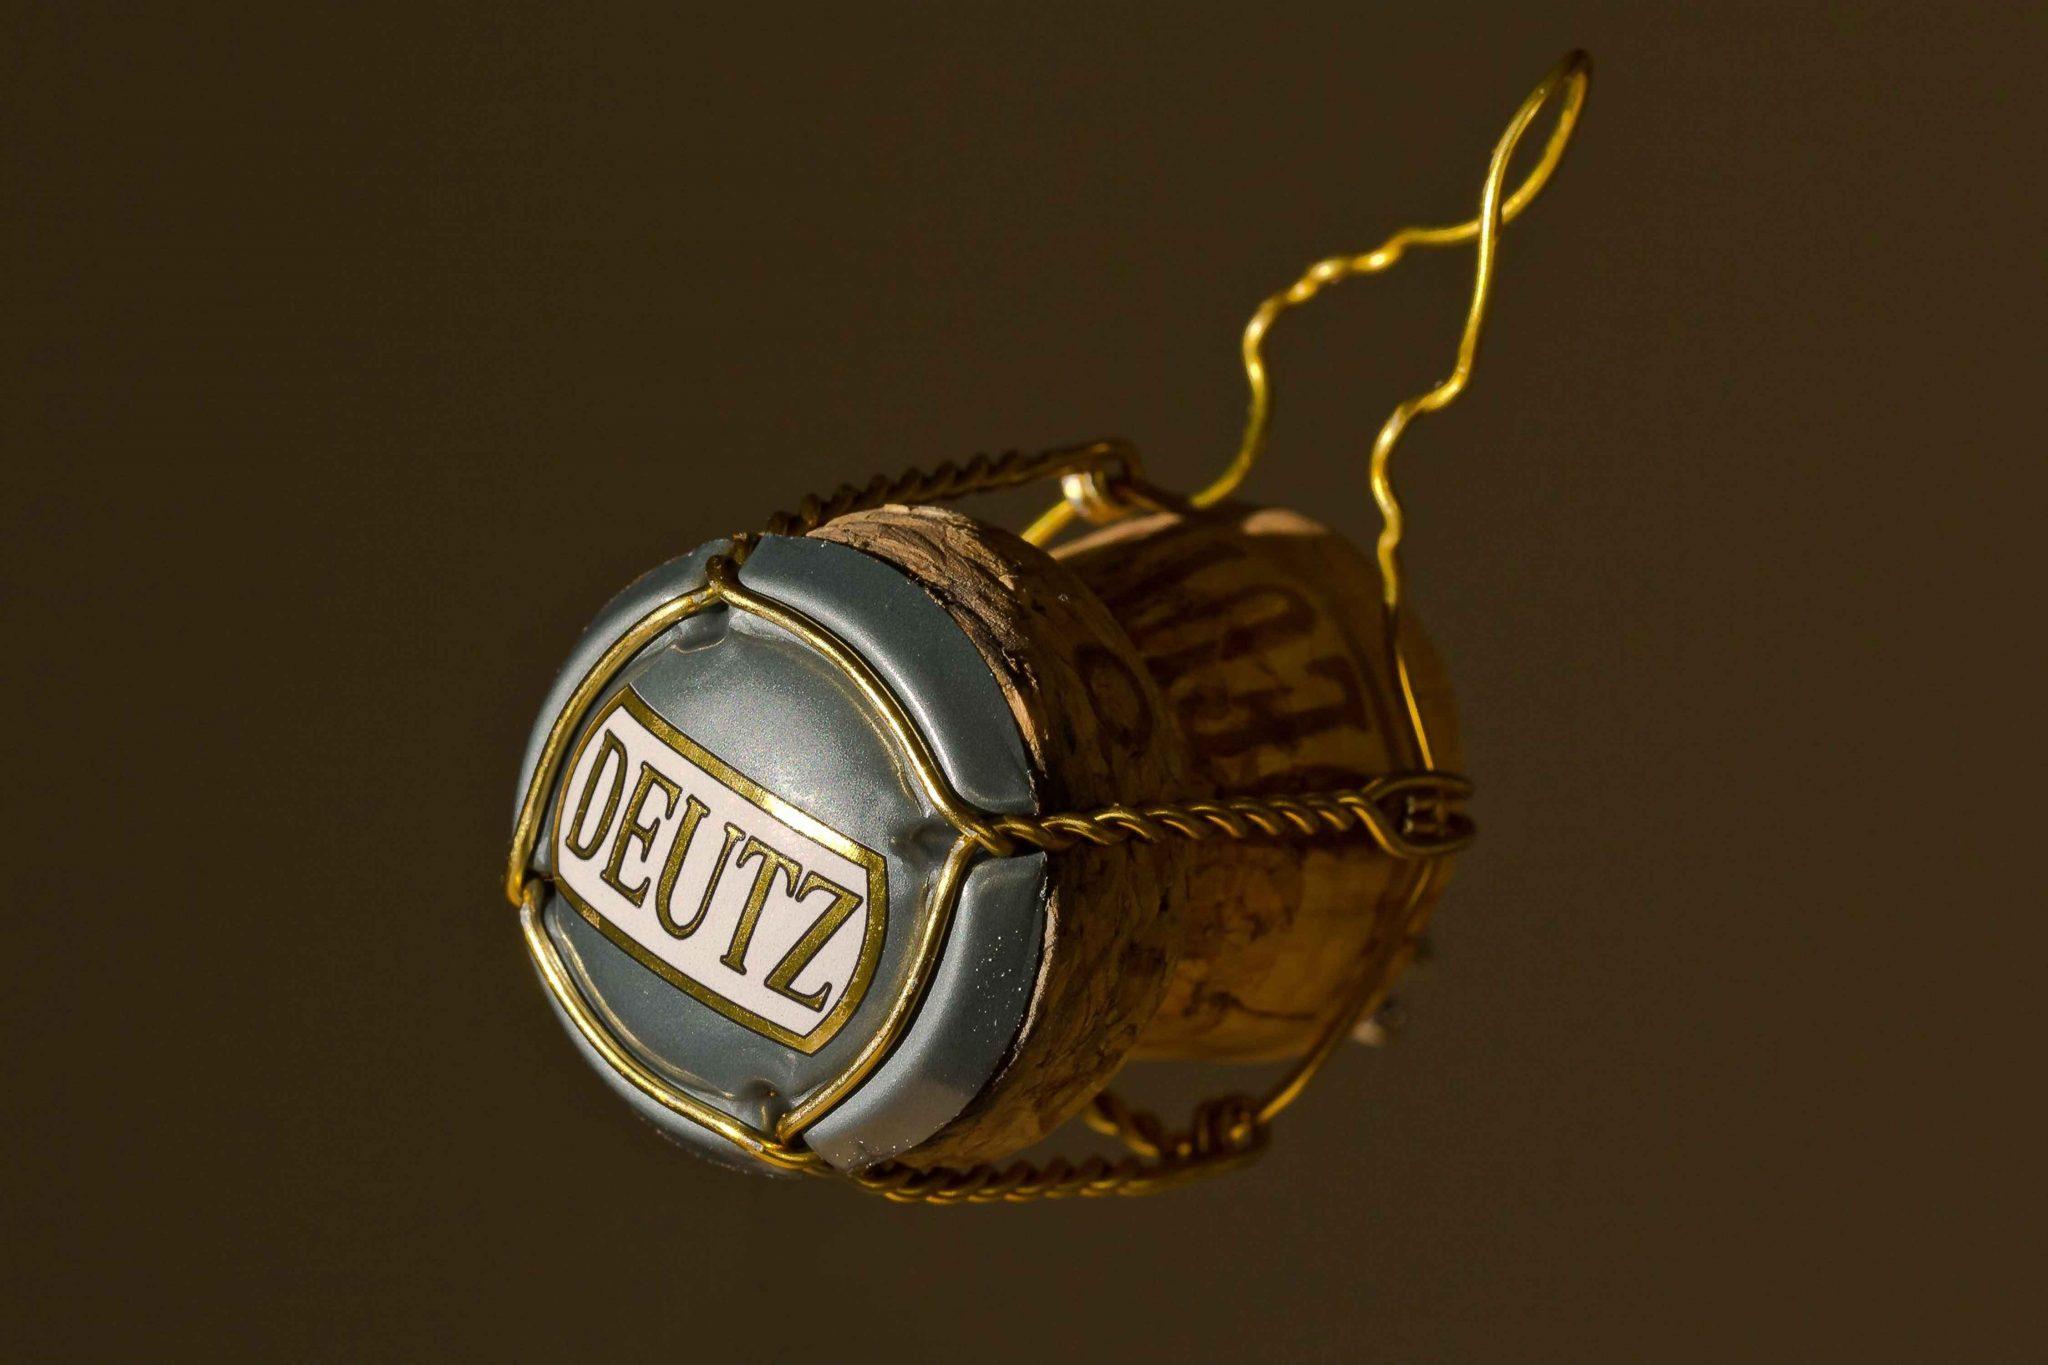 Deutz Champagner - Preis